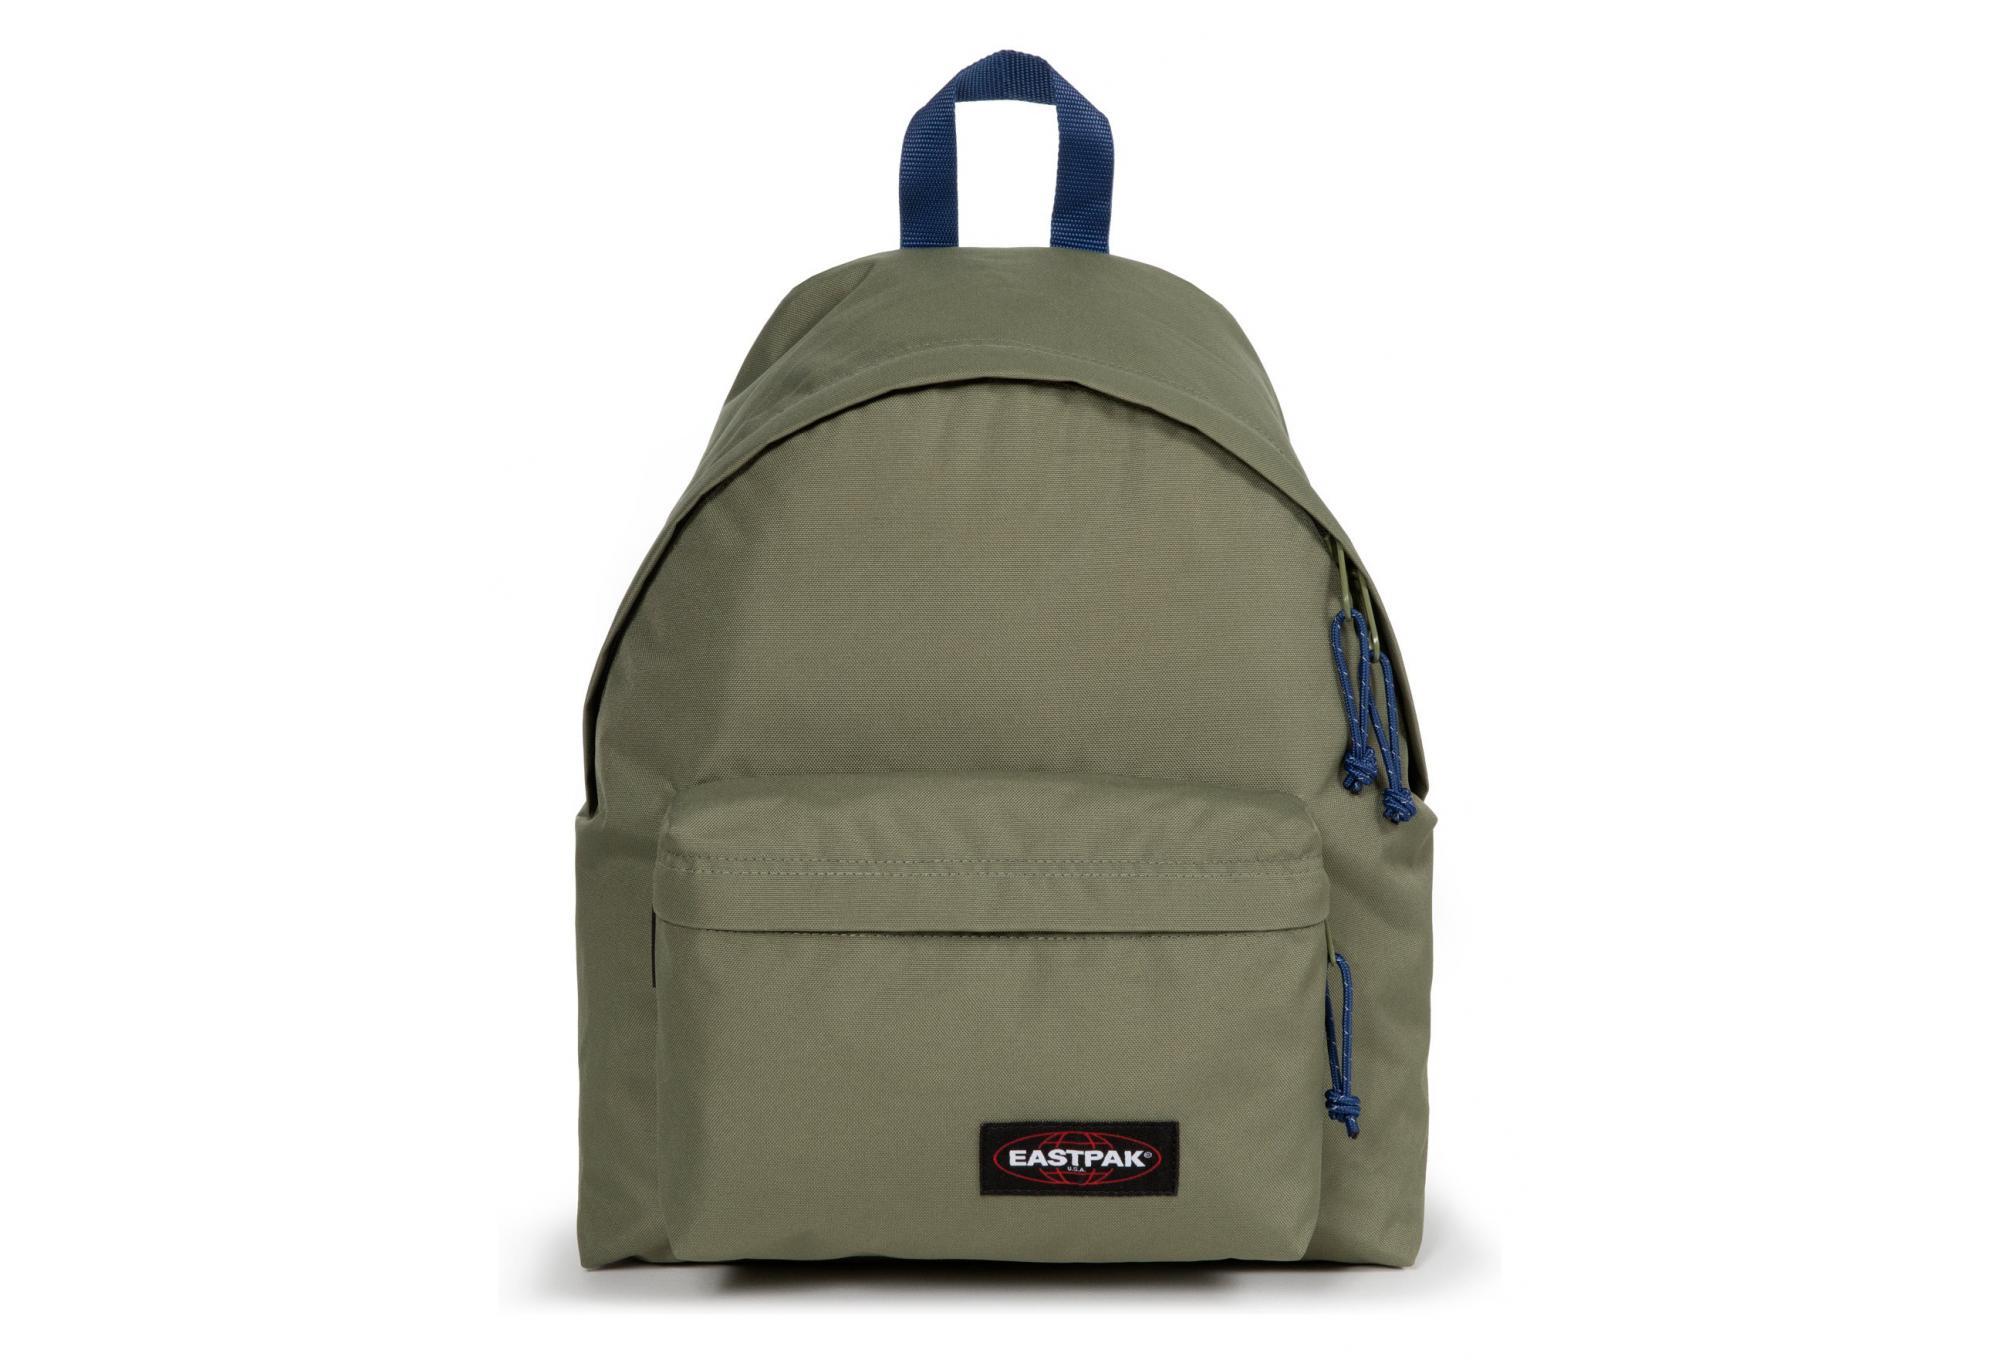 speciale promotie goedkoop kopen schoonheid Eastpak Padded Pak'R Backpack Chatty Khaki-Blue